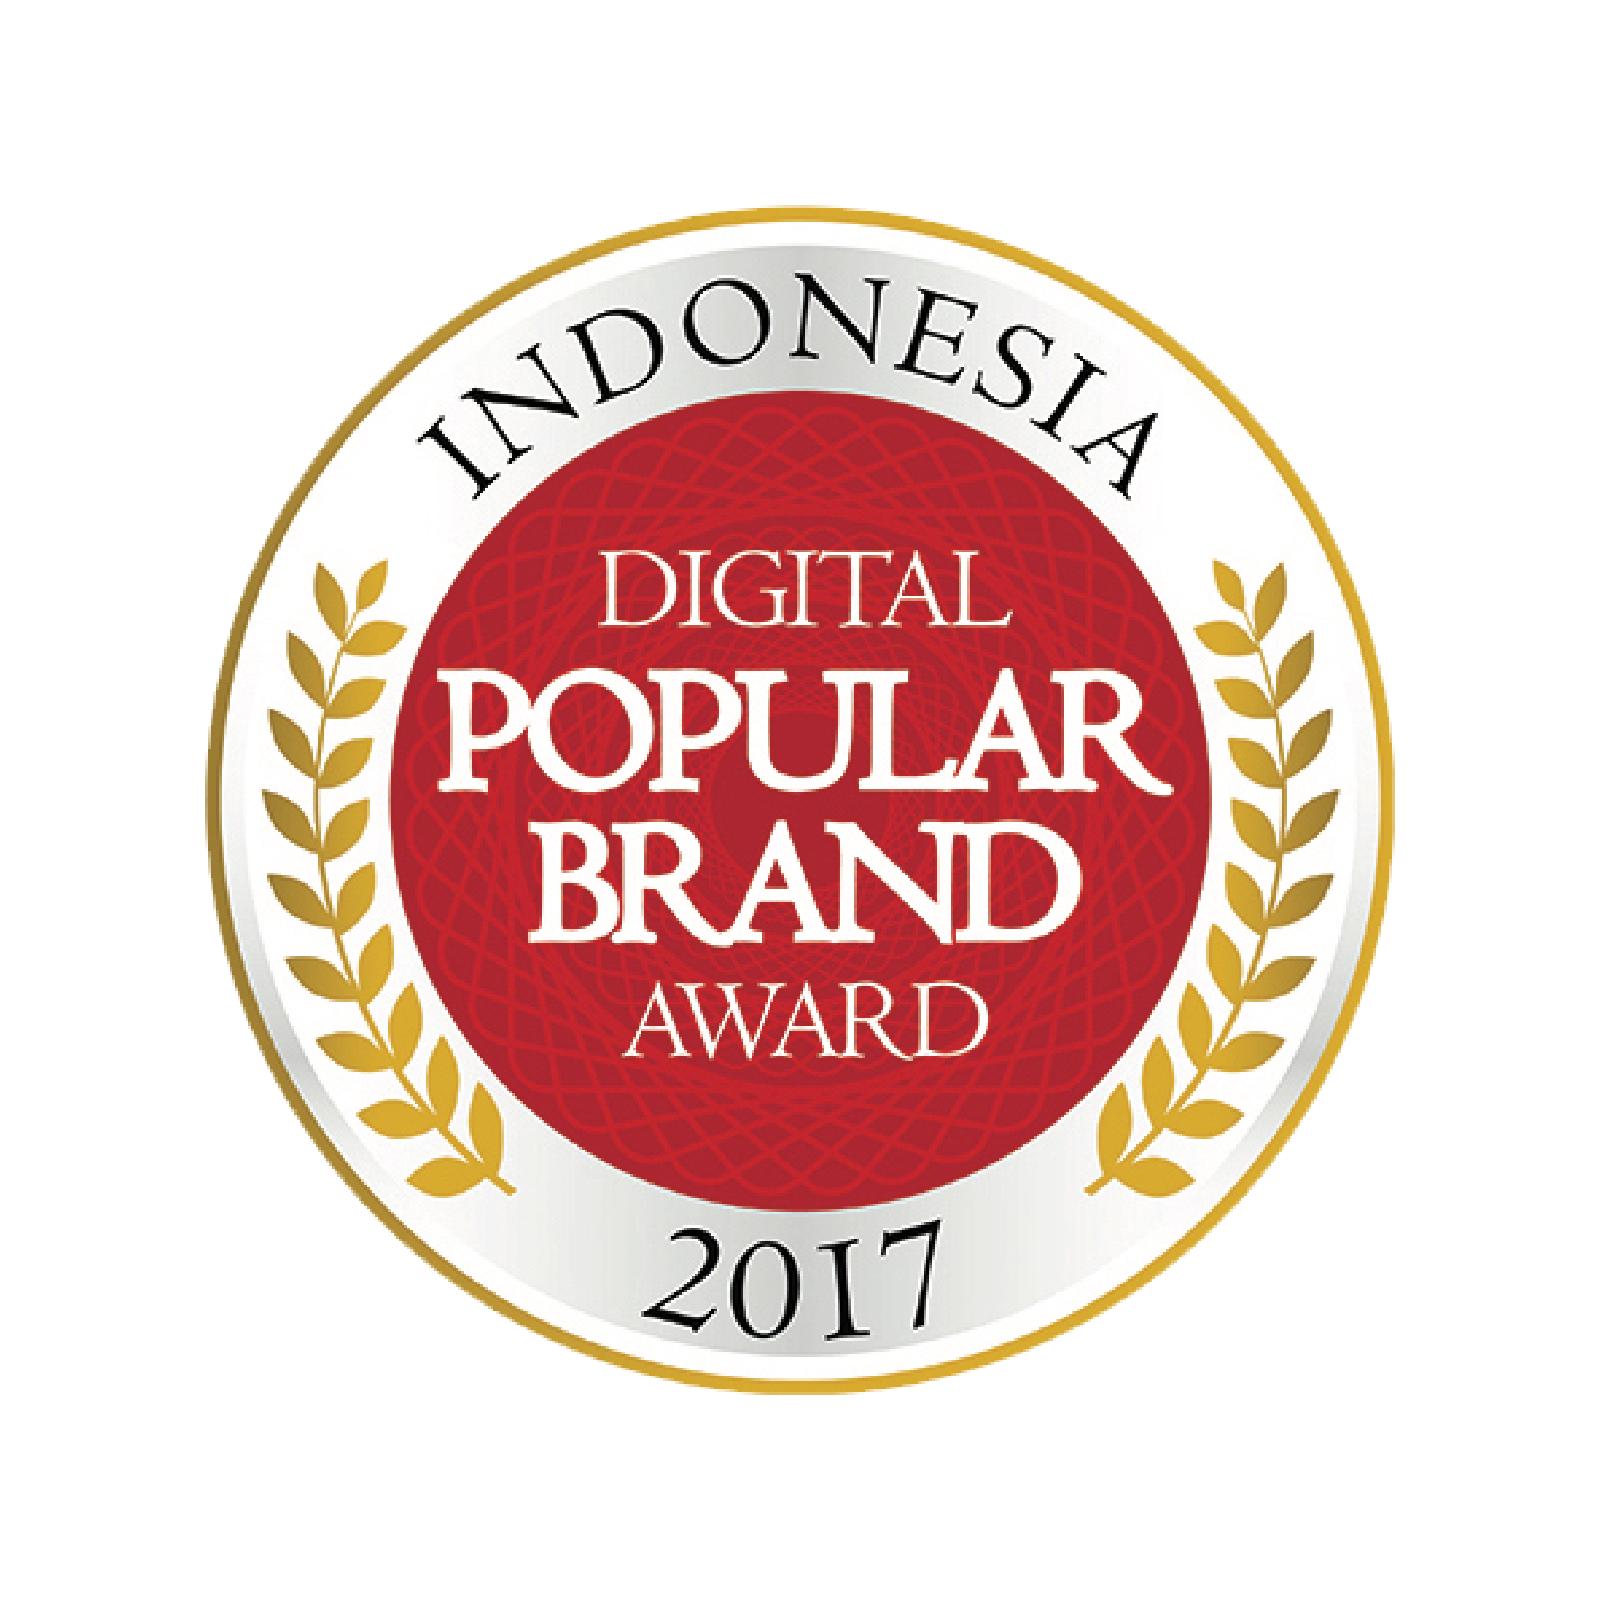 Indonesia Digital Popular Brand Award 2017